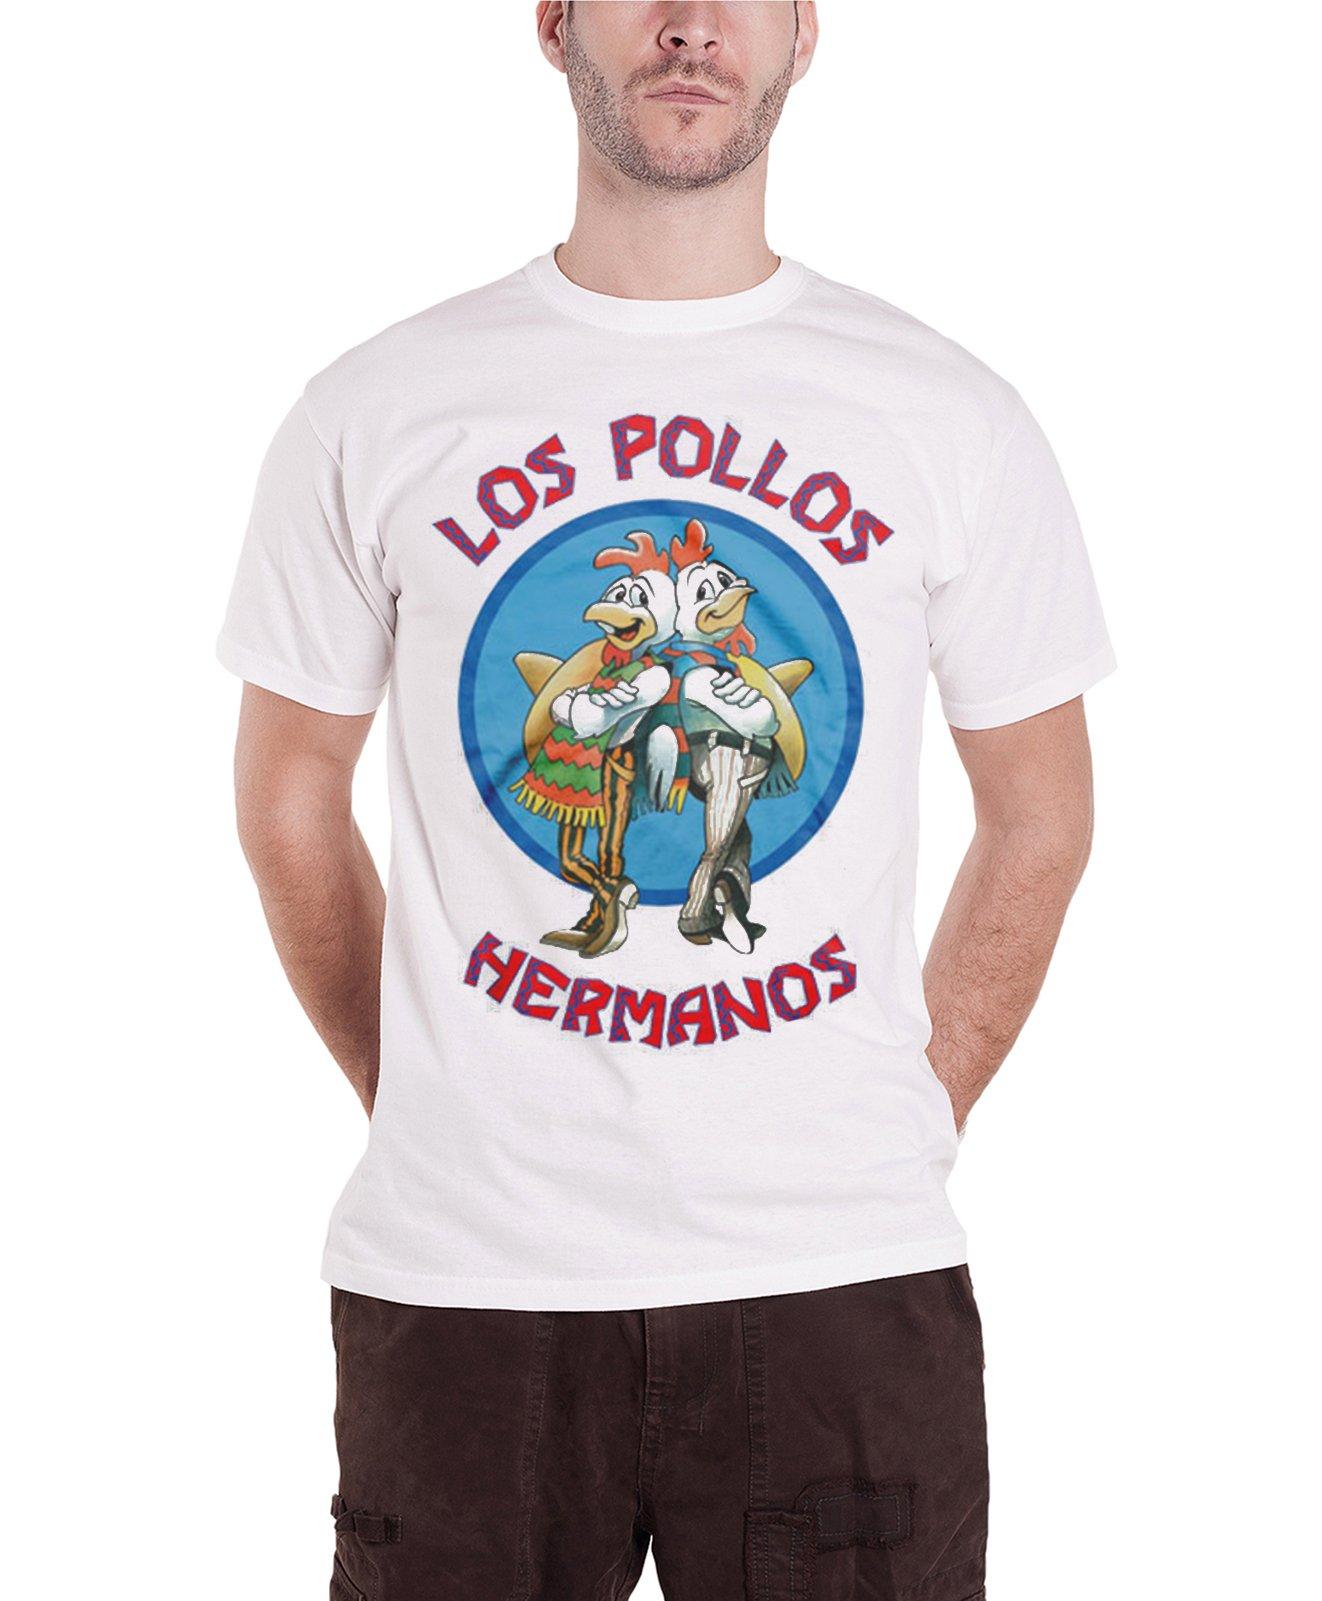 Breaking Bad Merchandise Los Pollos Hermanos T Shirt 2040